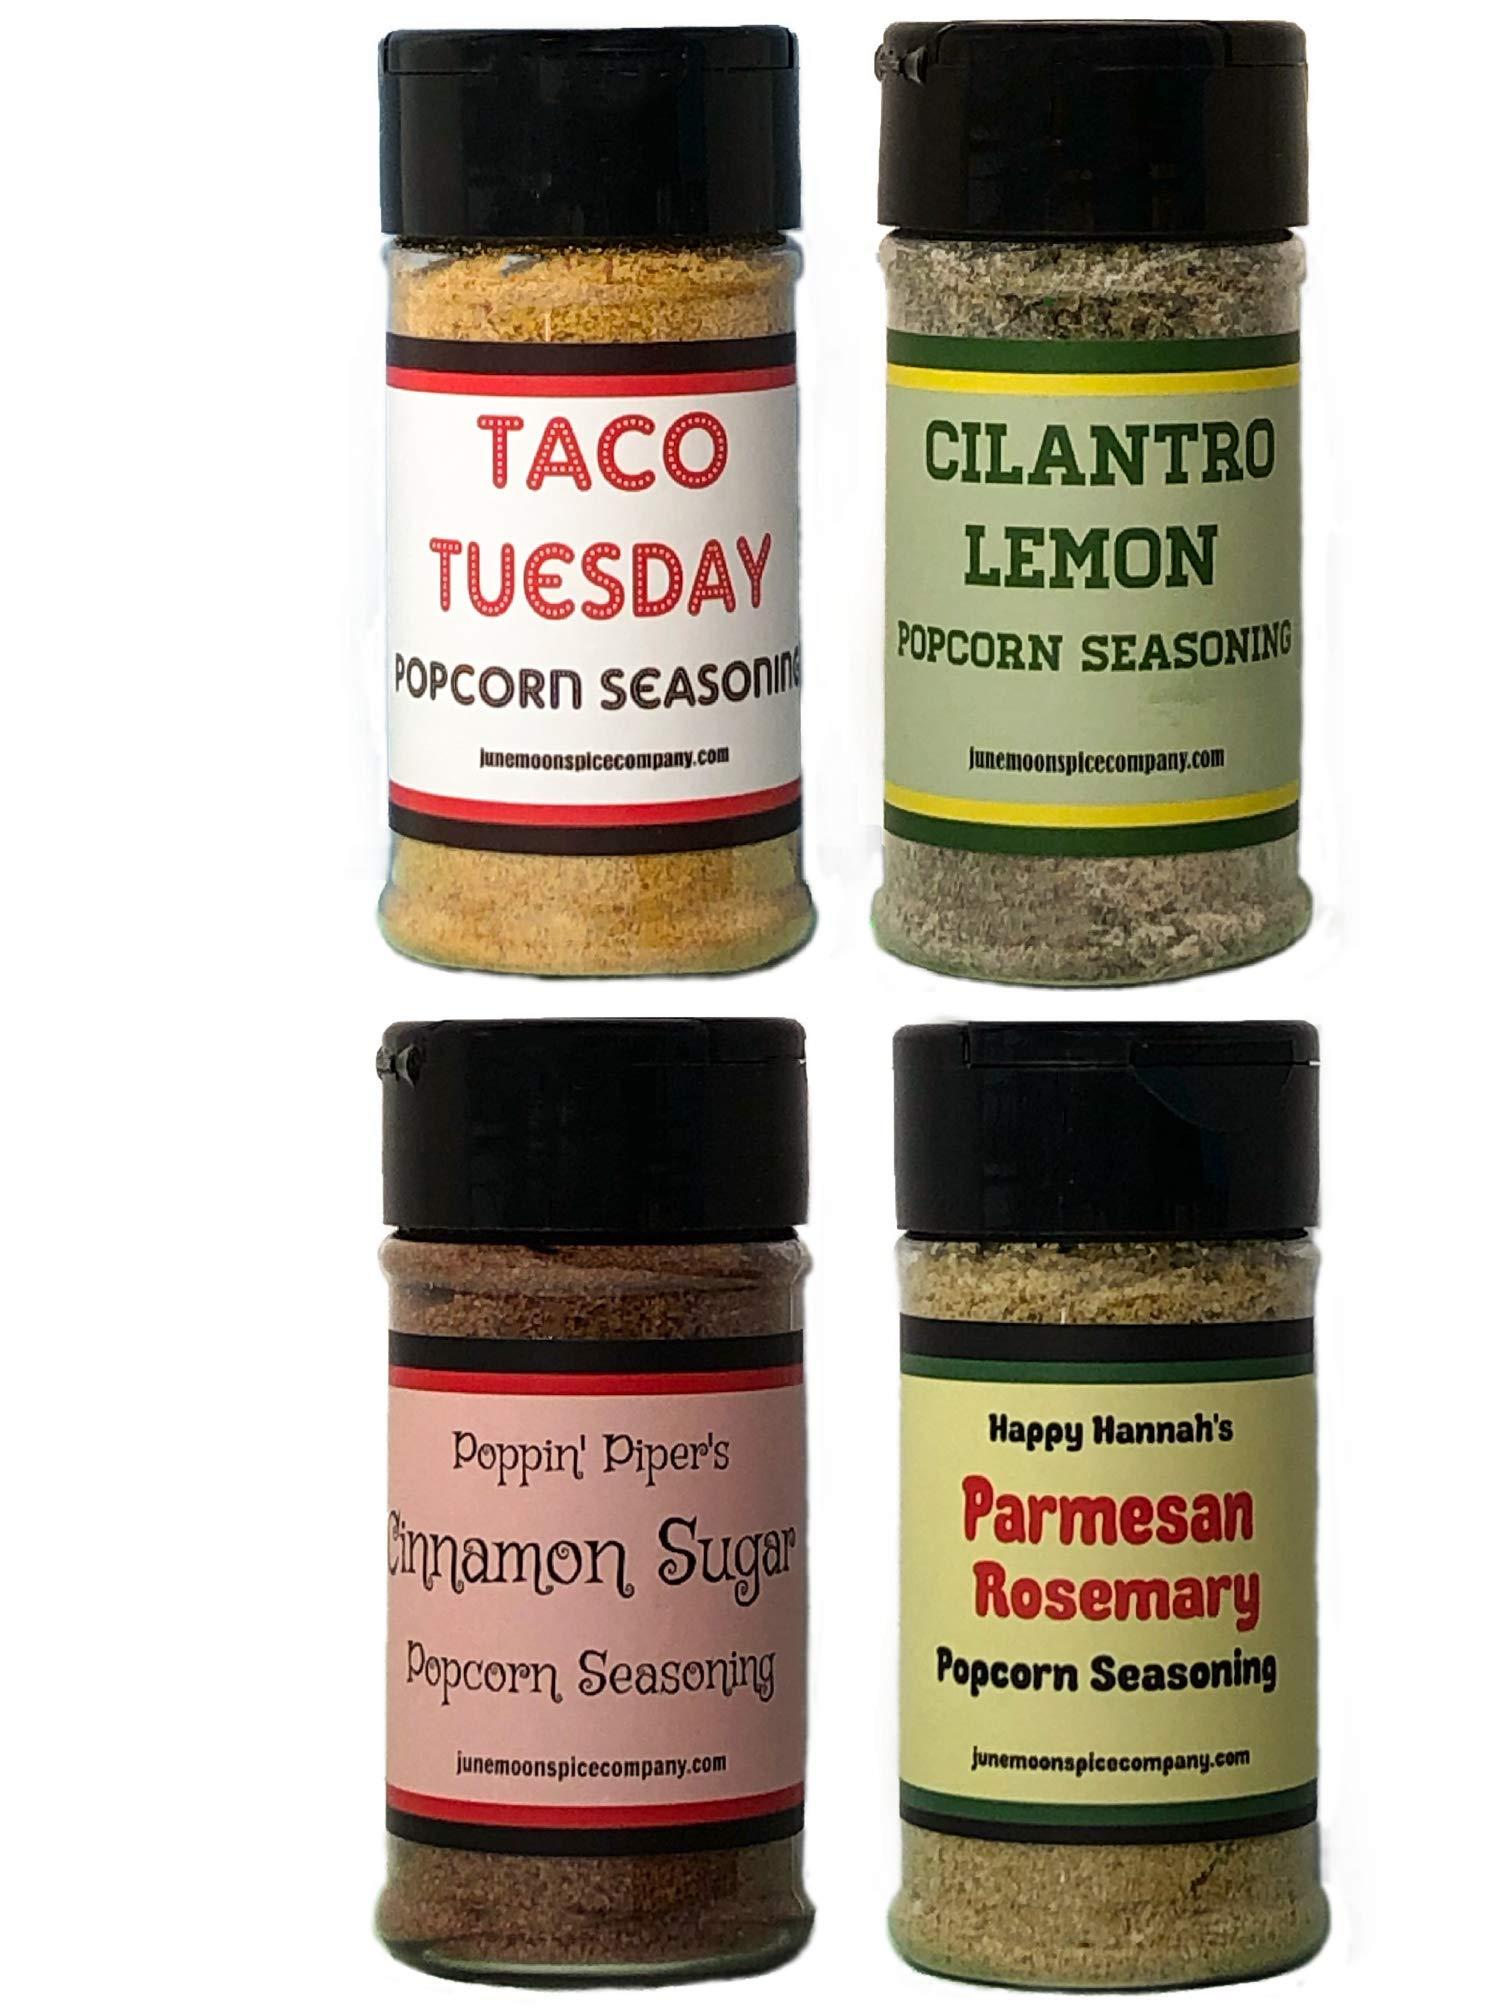 Premium | POPCORN SEASONING Variety 4 Pack | Burlap Hostess Bag Included | Cinnamon Sugar Popcorn Seasoning | Cilantro Lemon Popcorn Seasoning | Taco Tuesday | Rosemary Parmesan | 3.5 fl. oz.